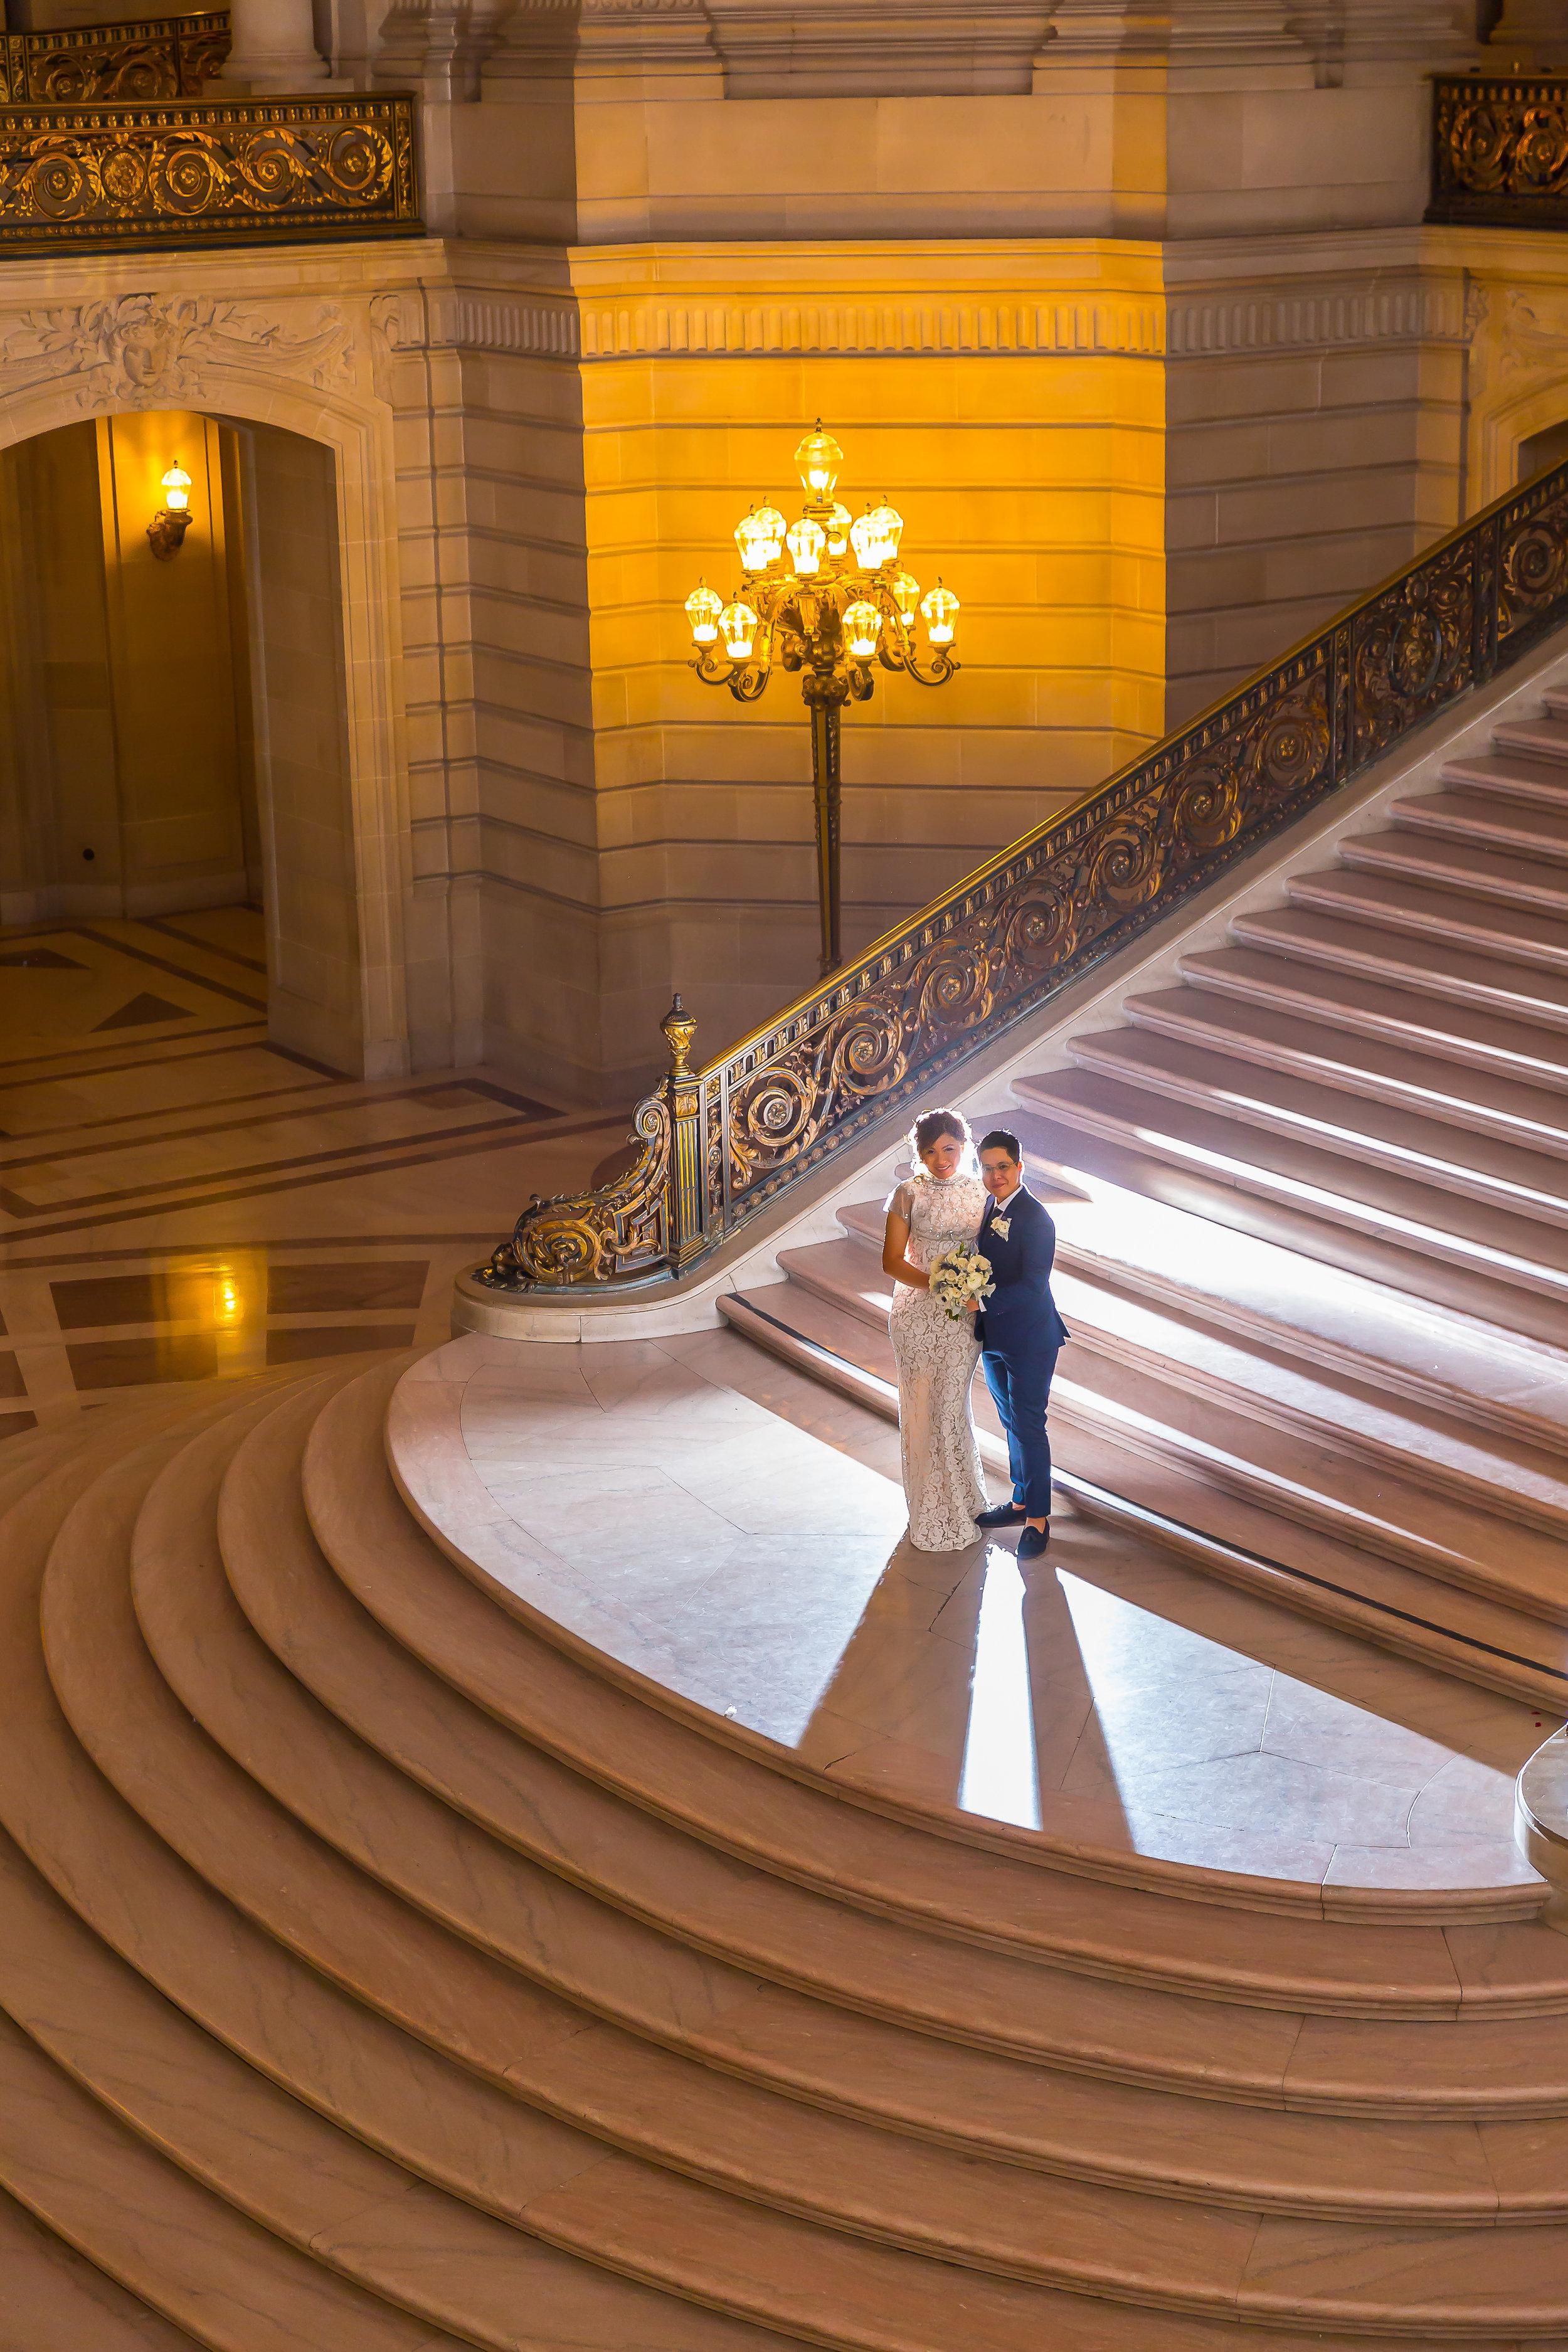 Toshi Tazawa Photography - San Francisco Destination Wedding Photographer-37g.jpg